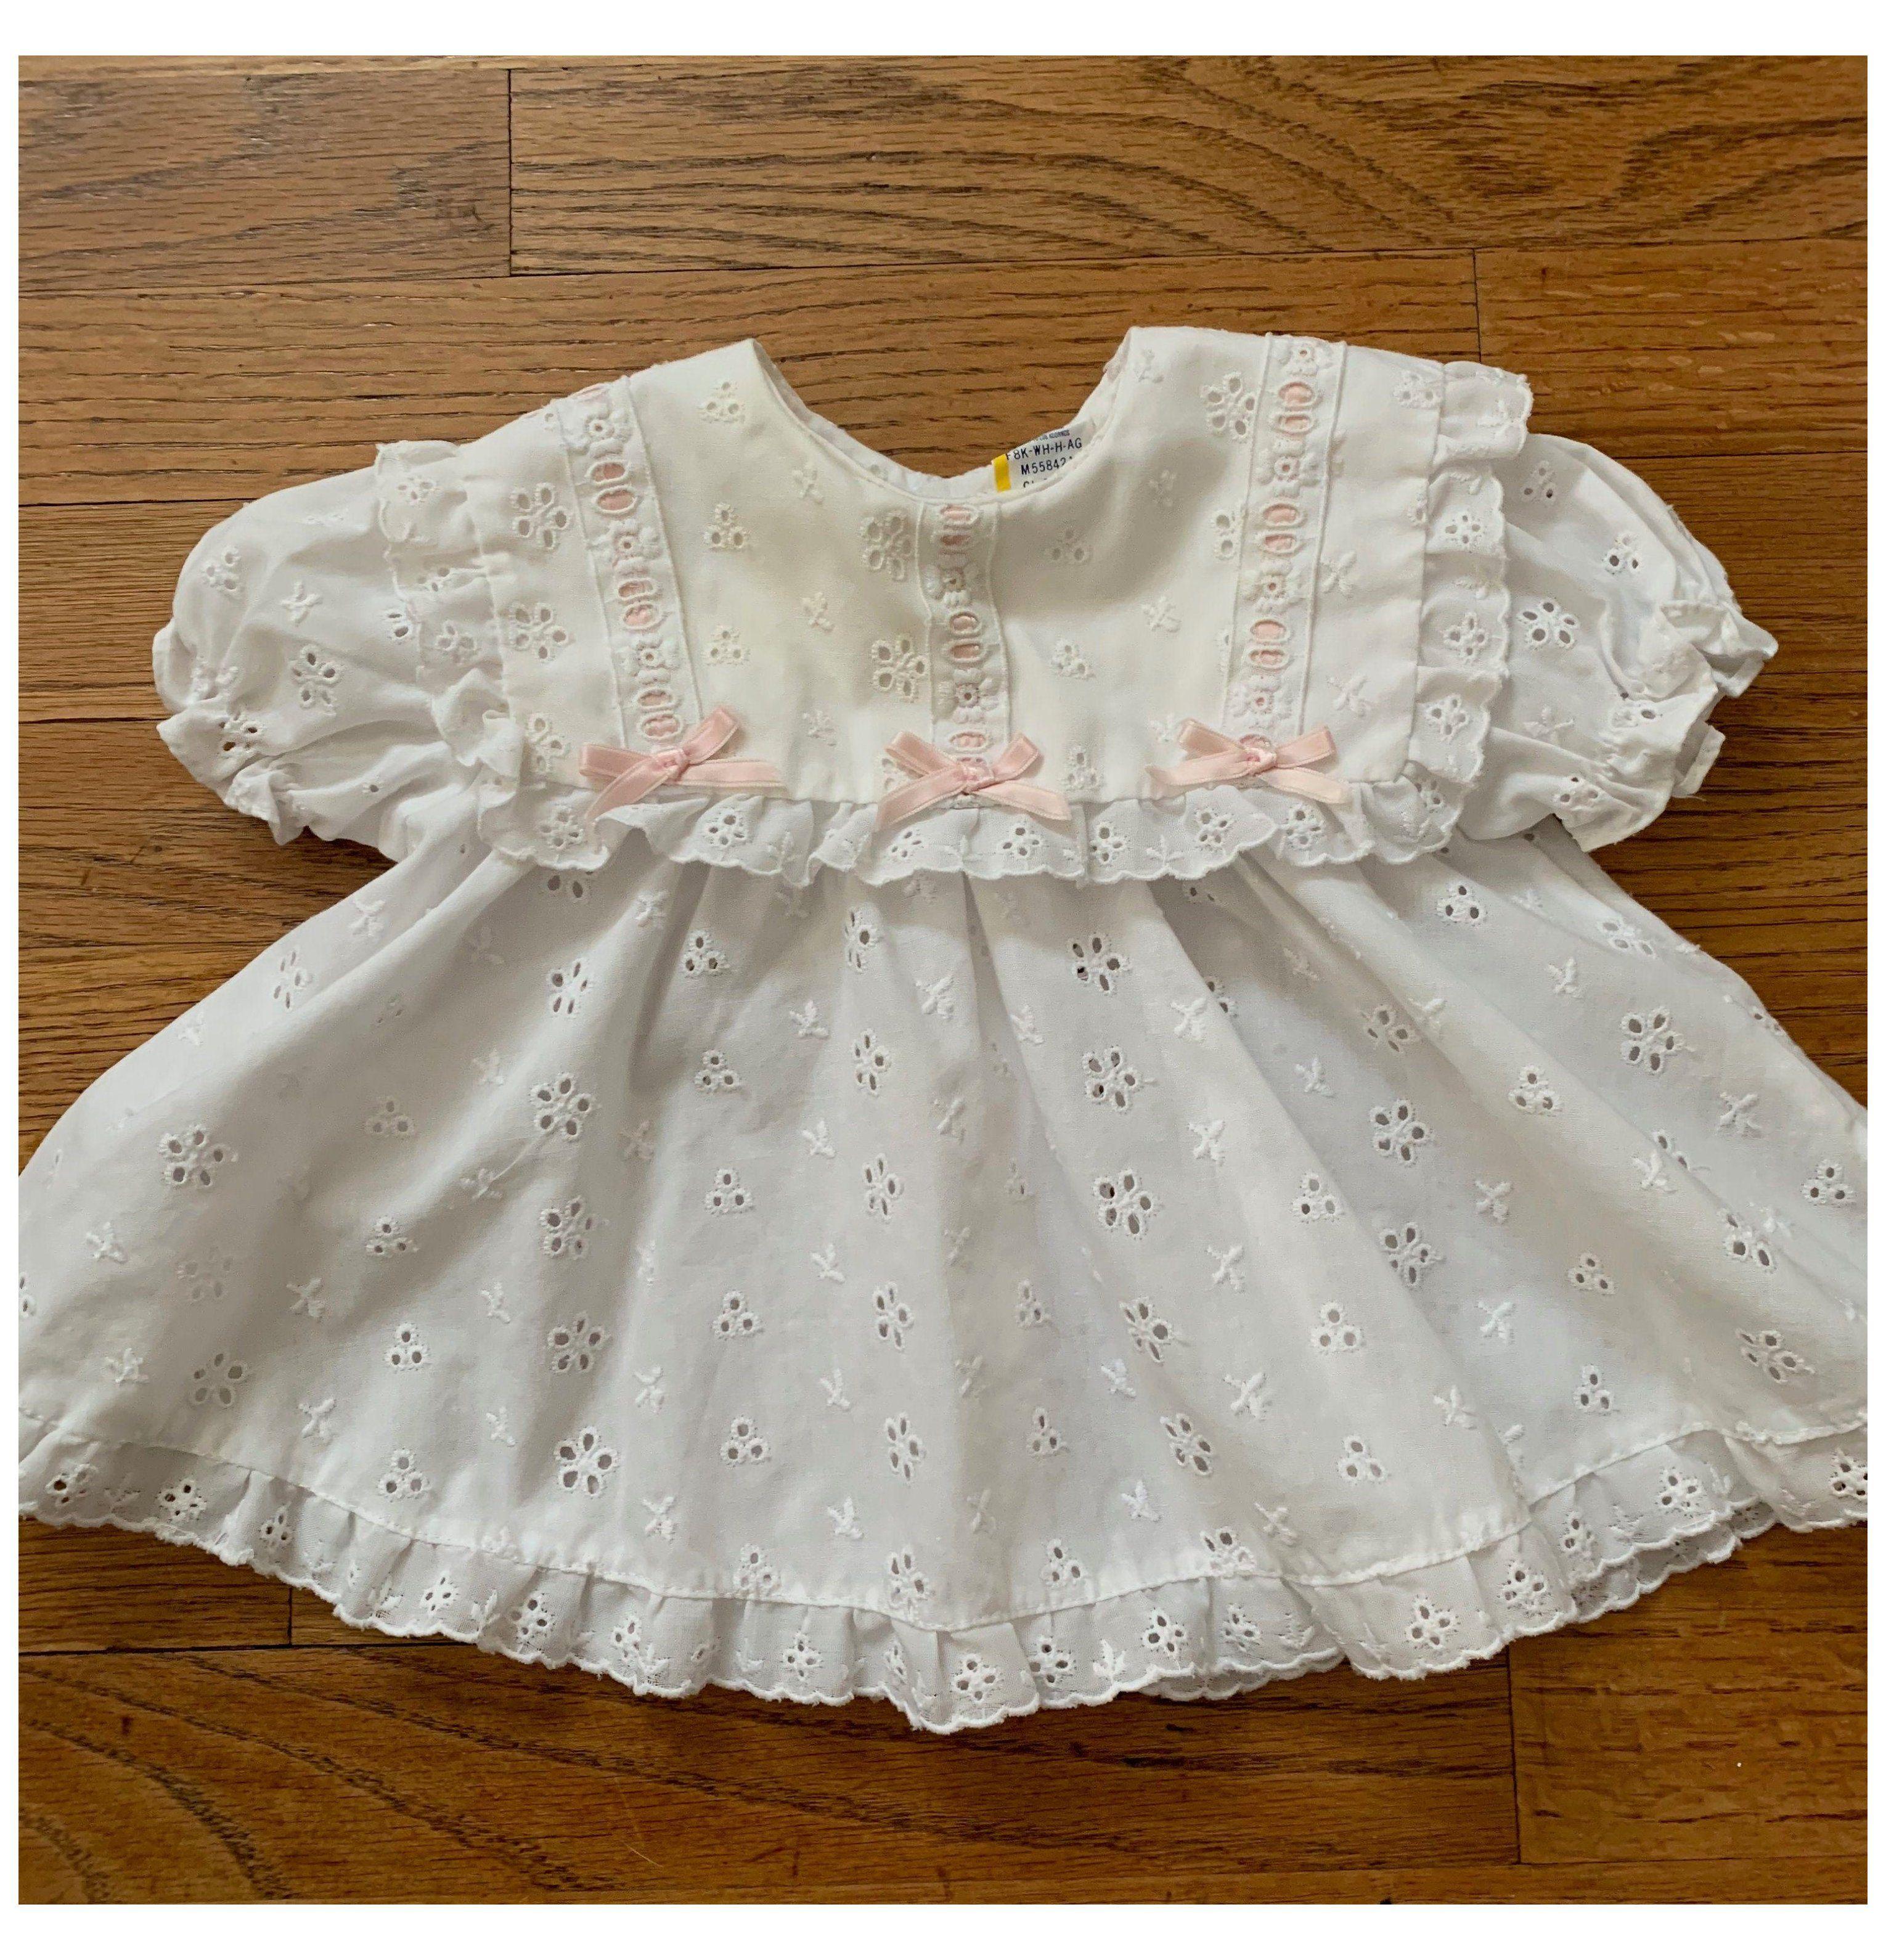 Pin By Melissa Arizaga On Bollito Vintage Baby Dresses Newborn Baby Dresses Vintage Baby Girl [ 3180 x 3060 Pixel ]